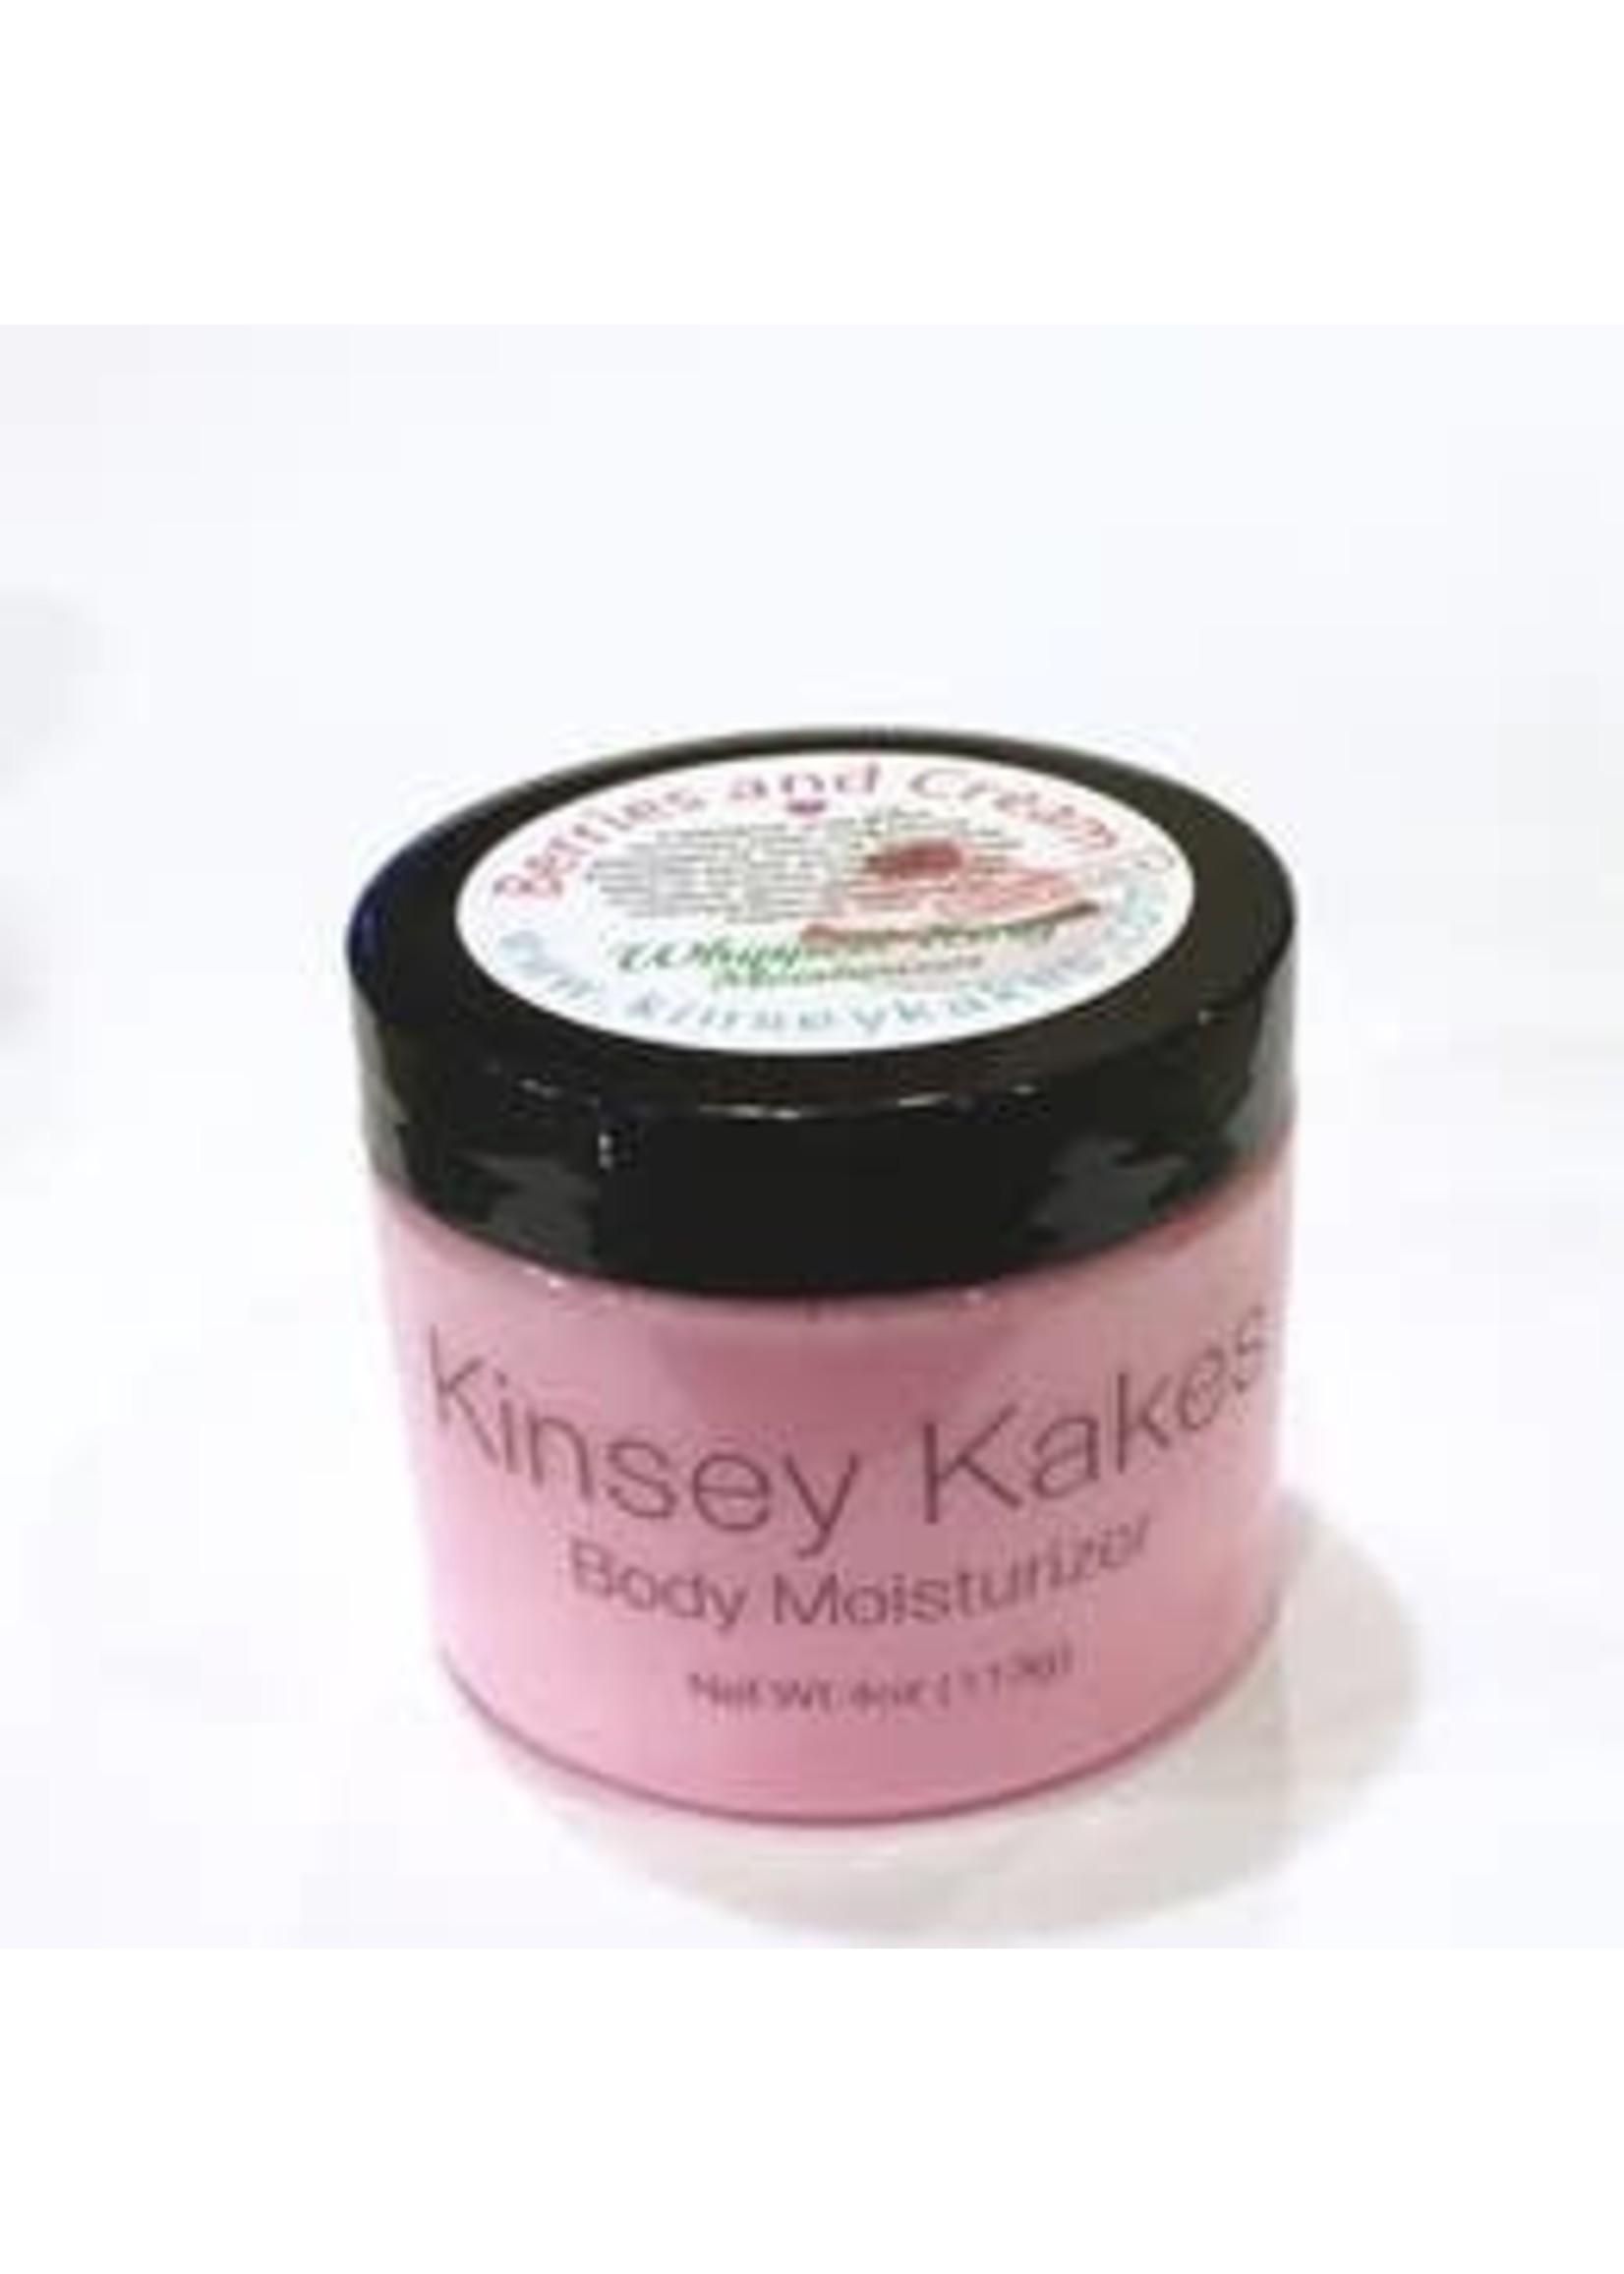 Kinsey Kakes Bath Berries And Cream Body Icing